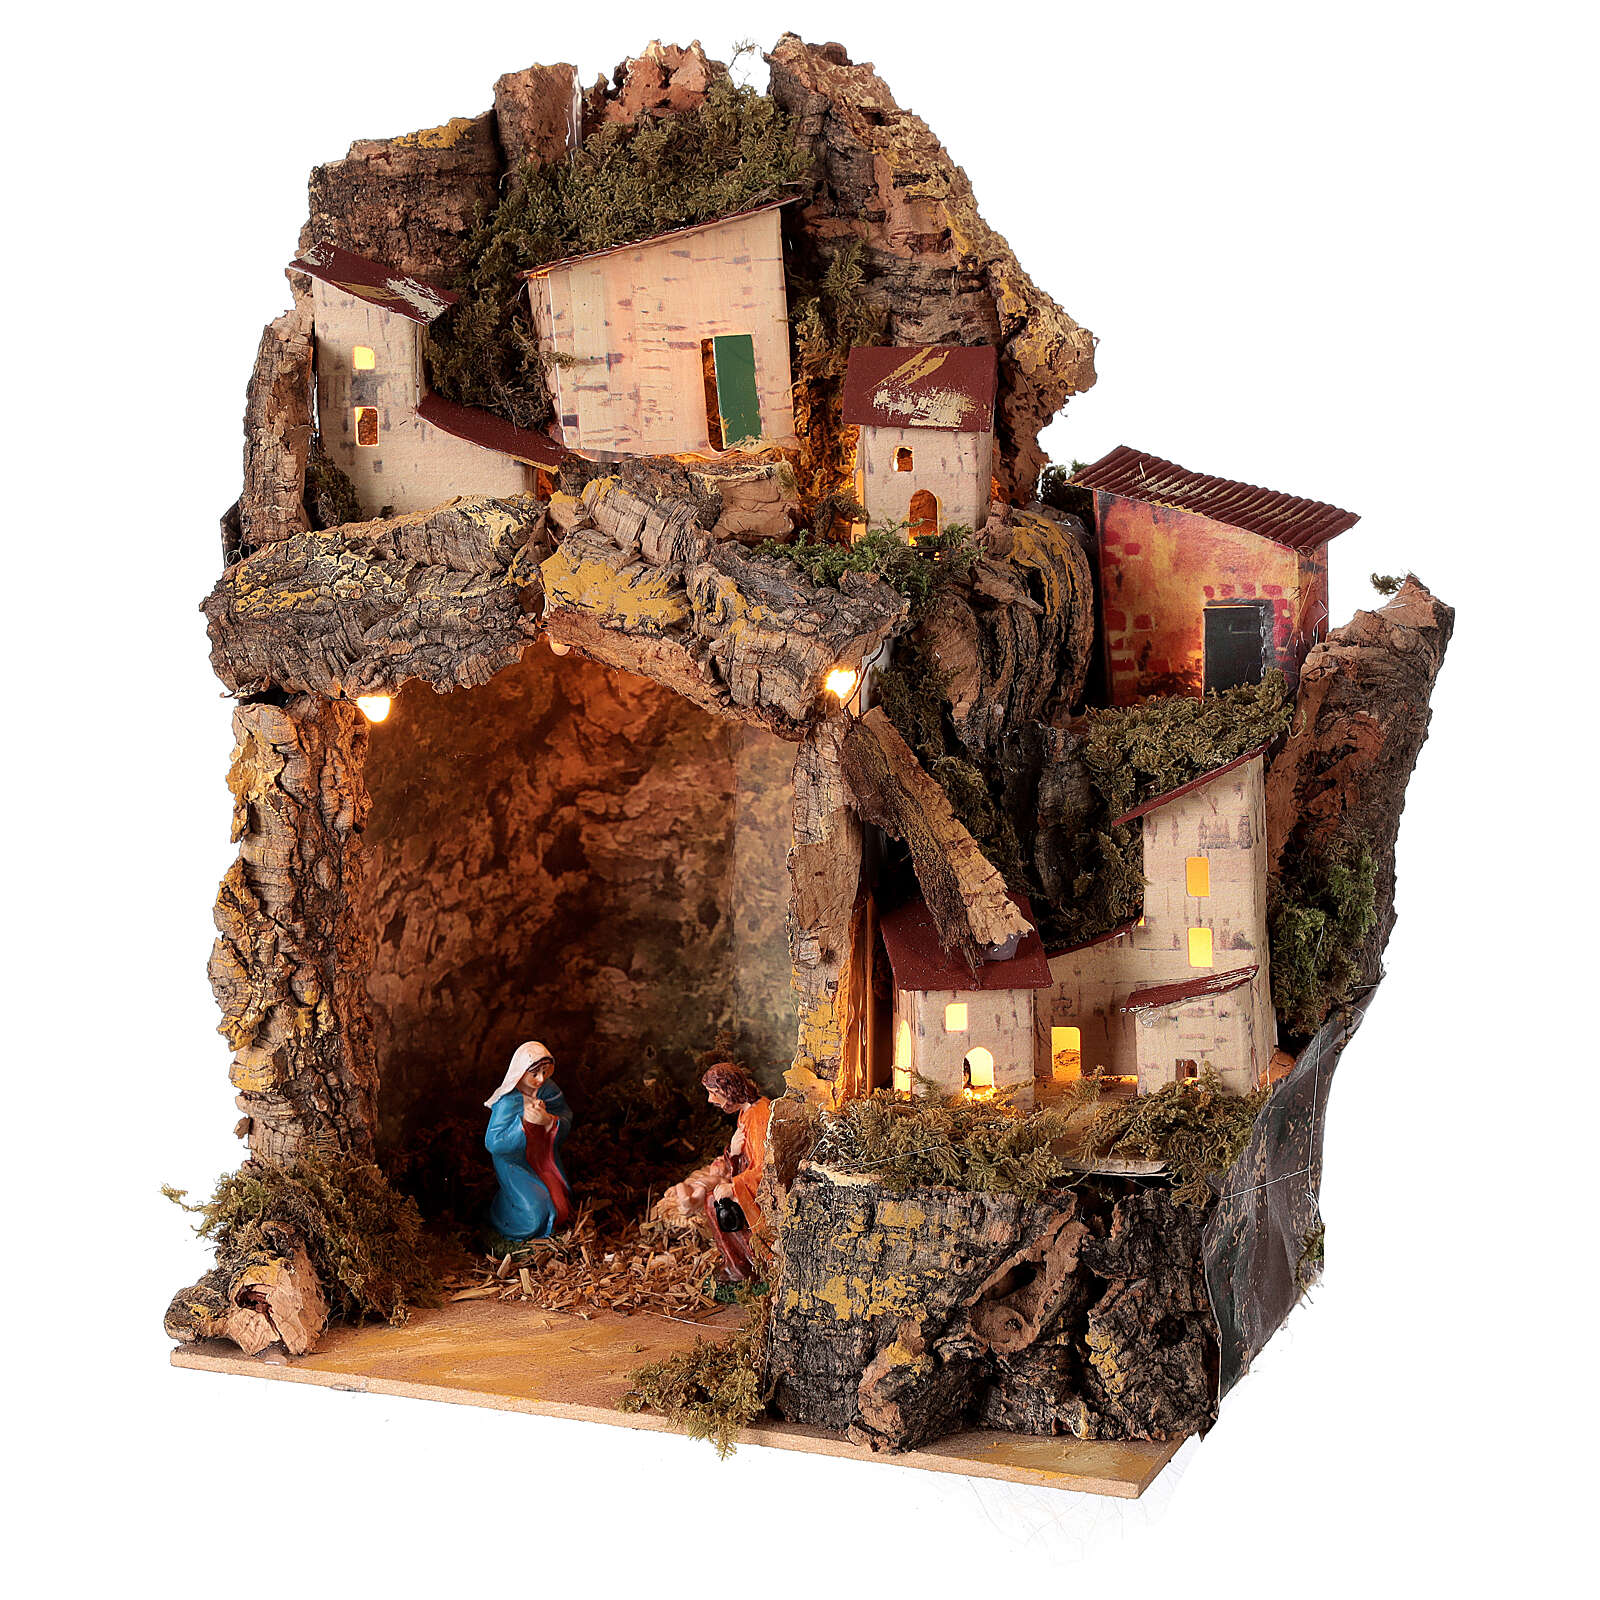 Nativity with lighted village 25x20x15 cm 6 cm figurines 4